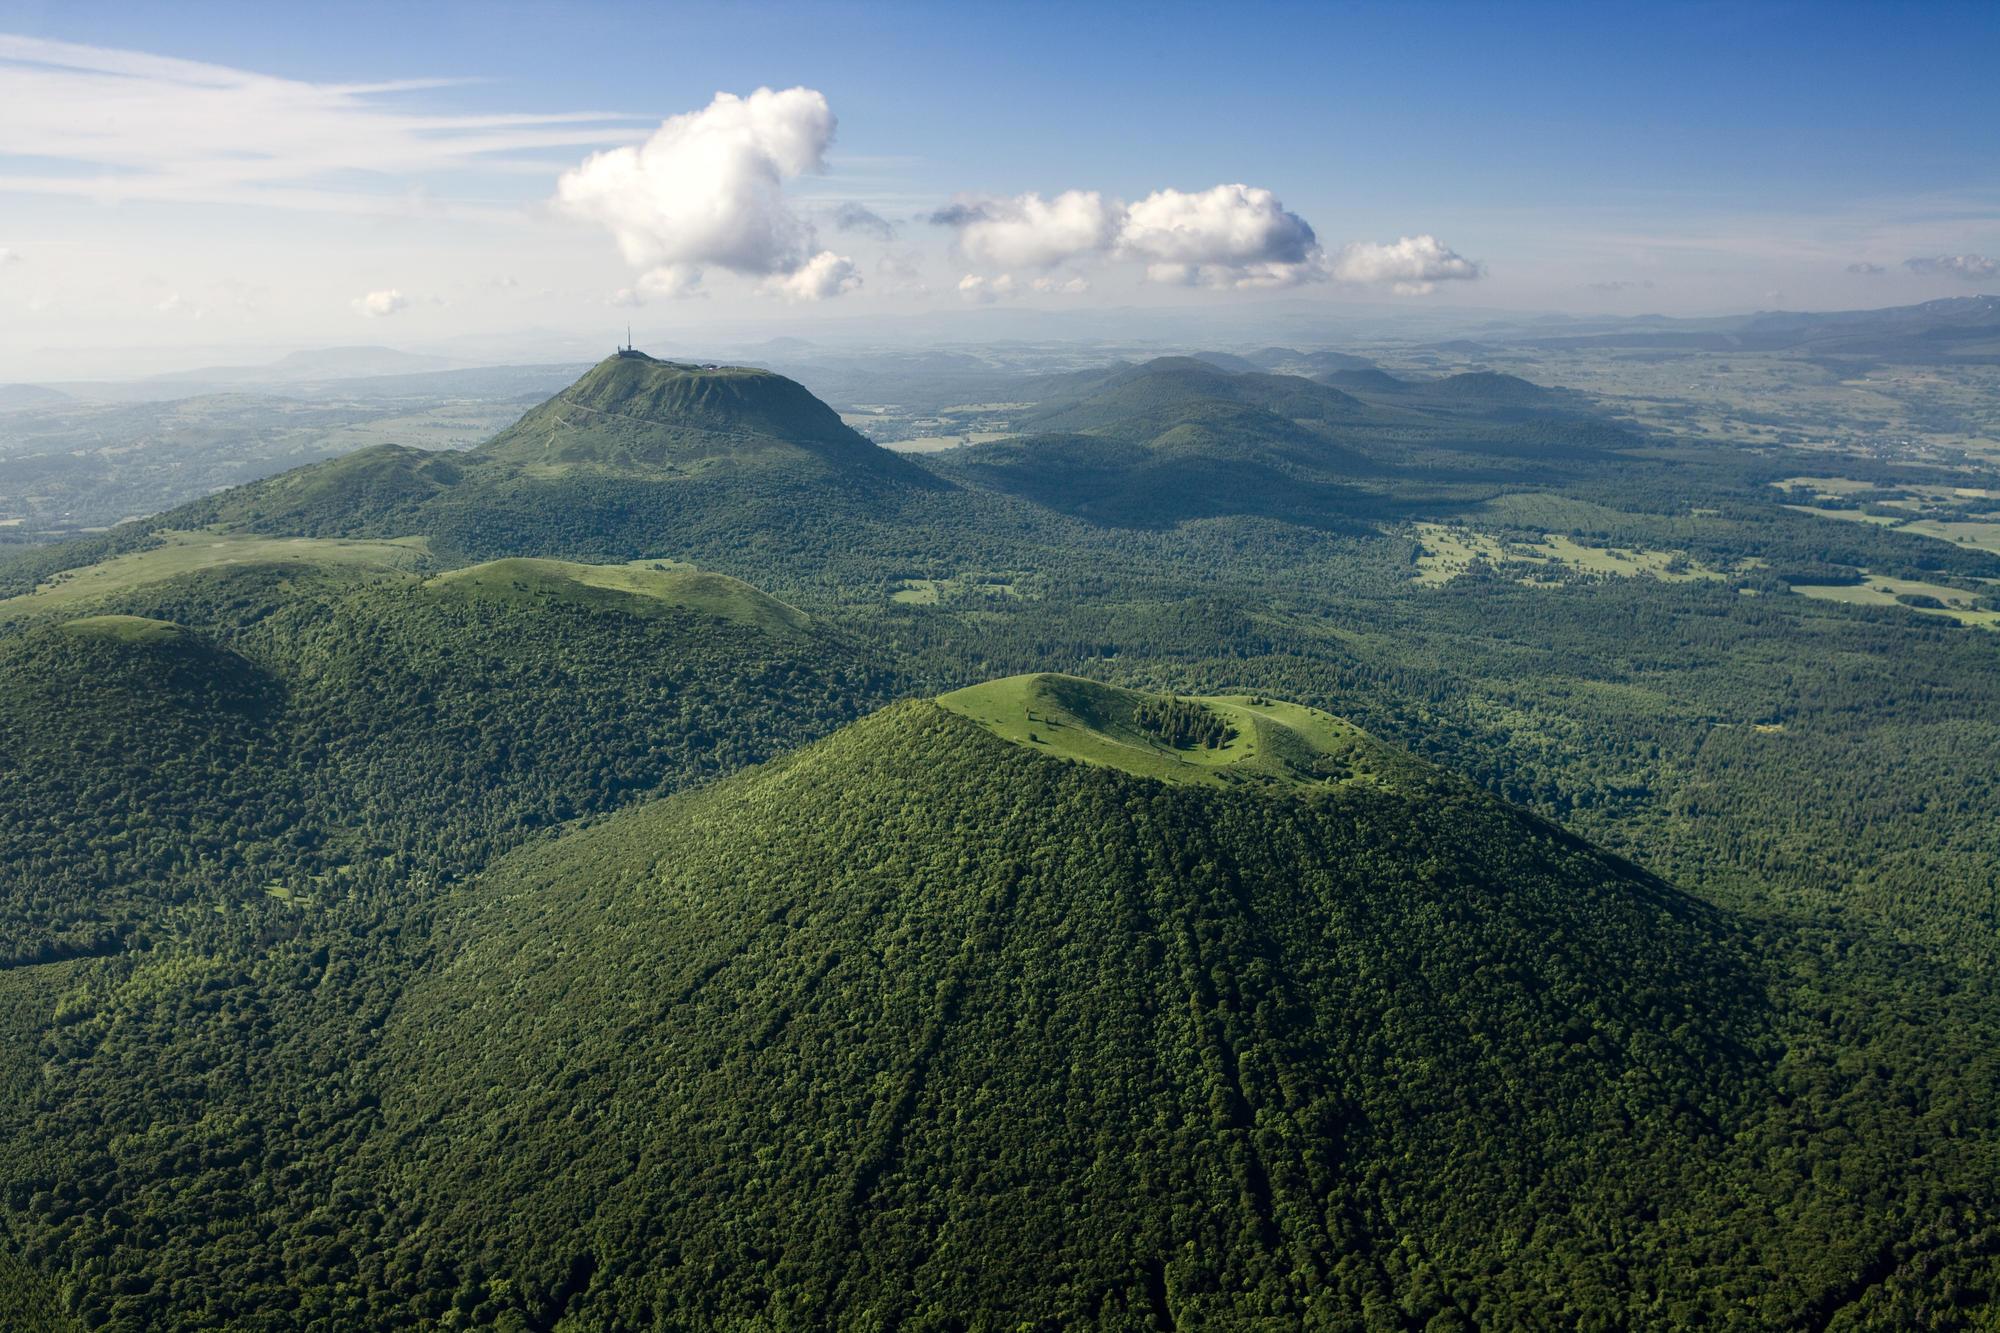 e4615a6d454  La Chaîne des Puys (Auvergne s Volcanoes) and the Limagne Fault included  on the Unesco World Heritage list